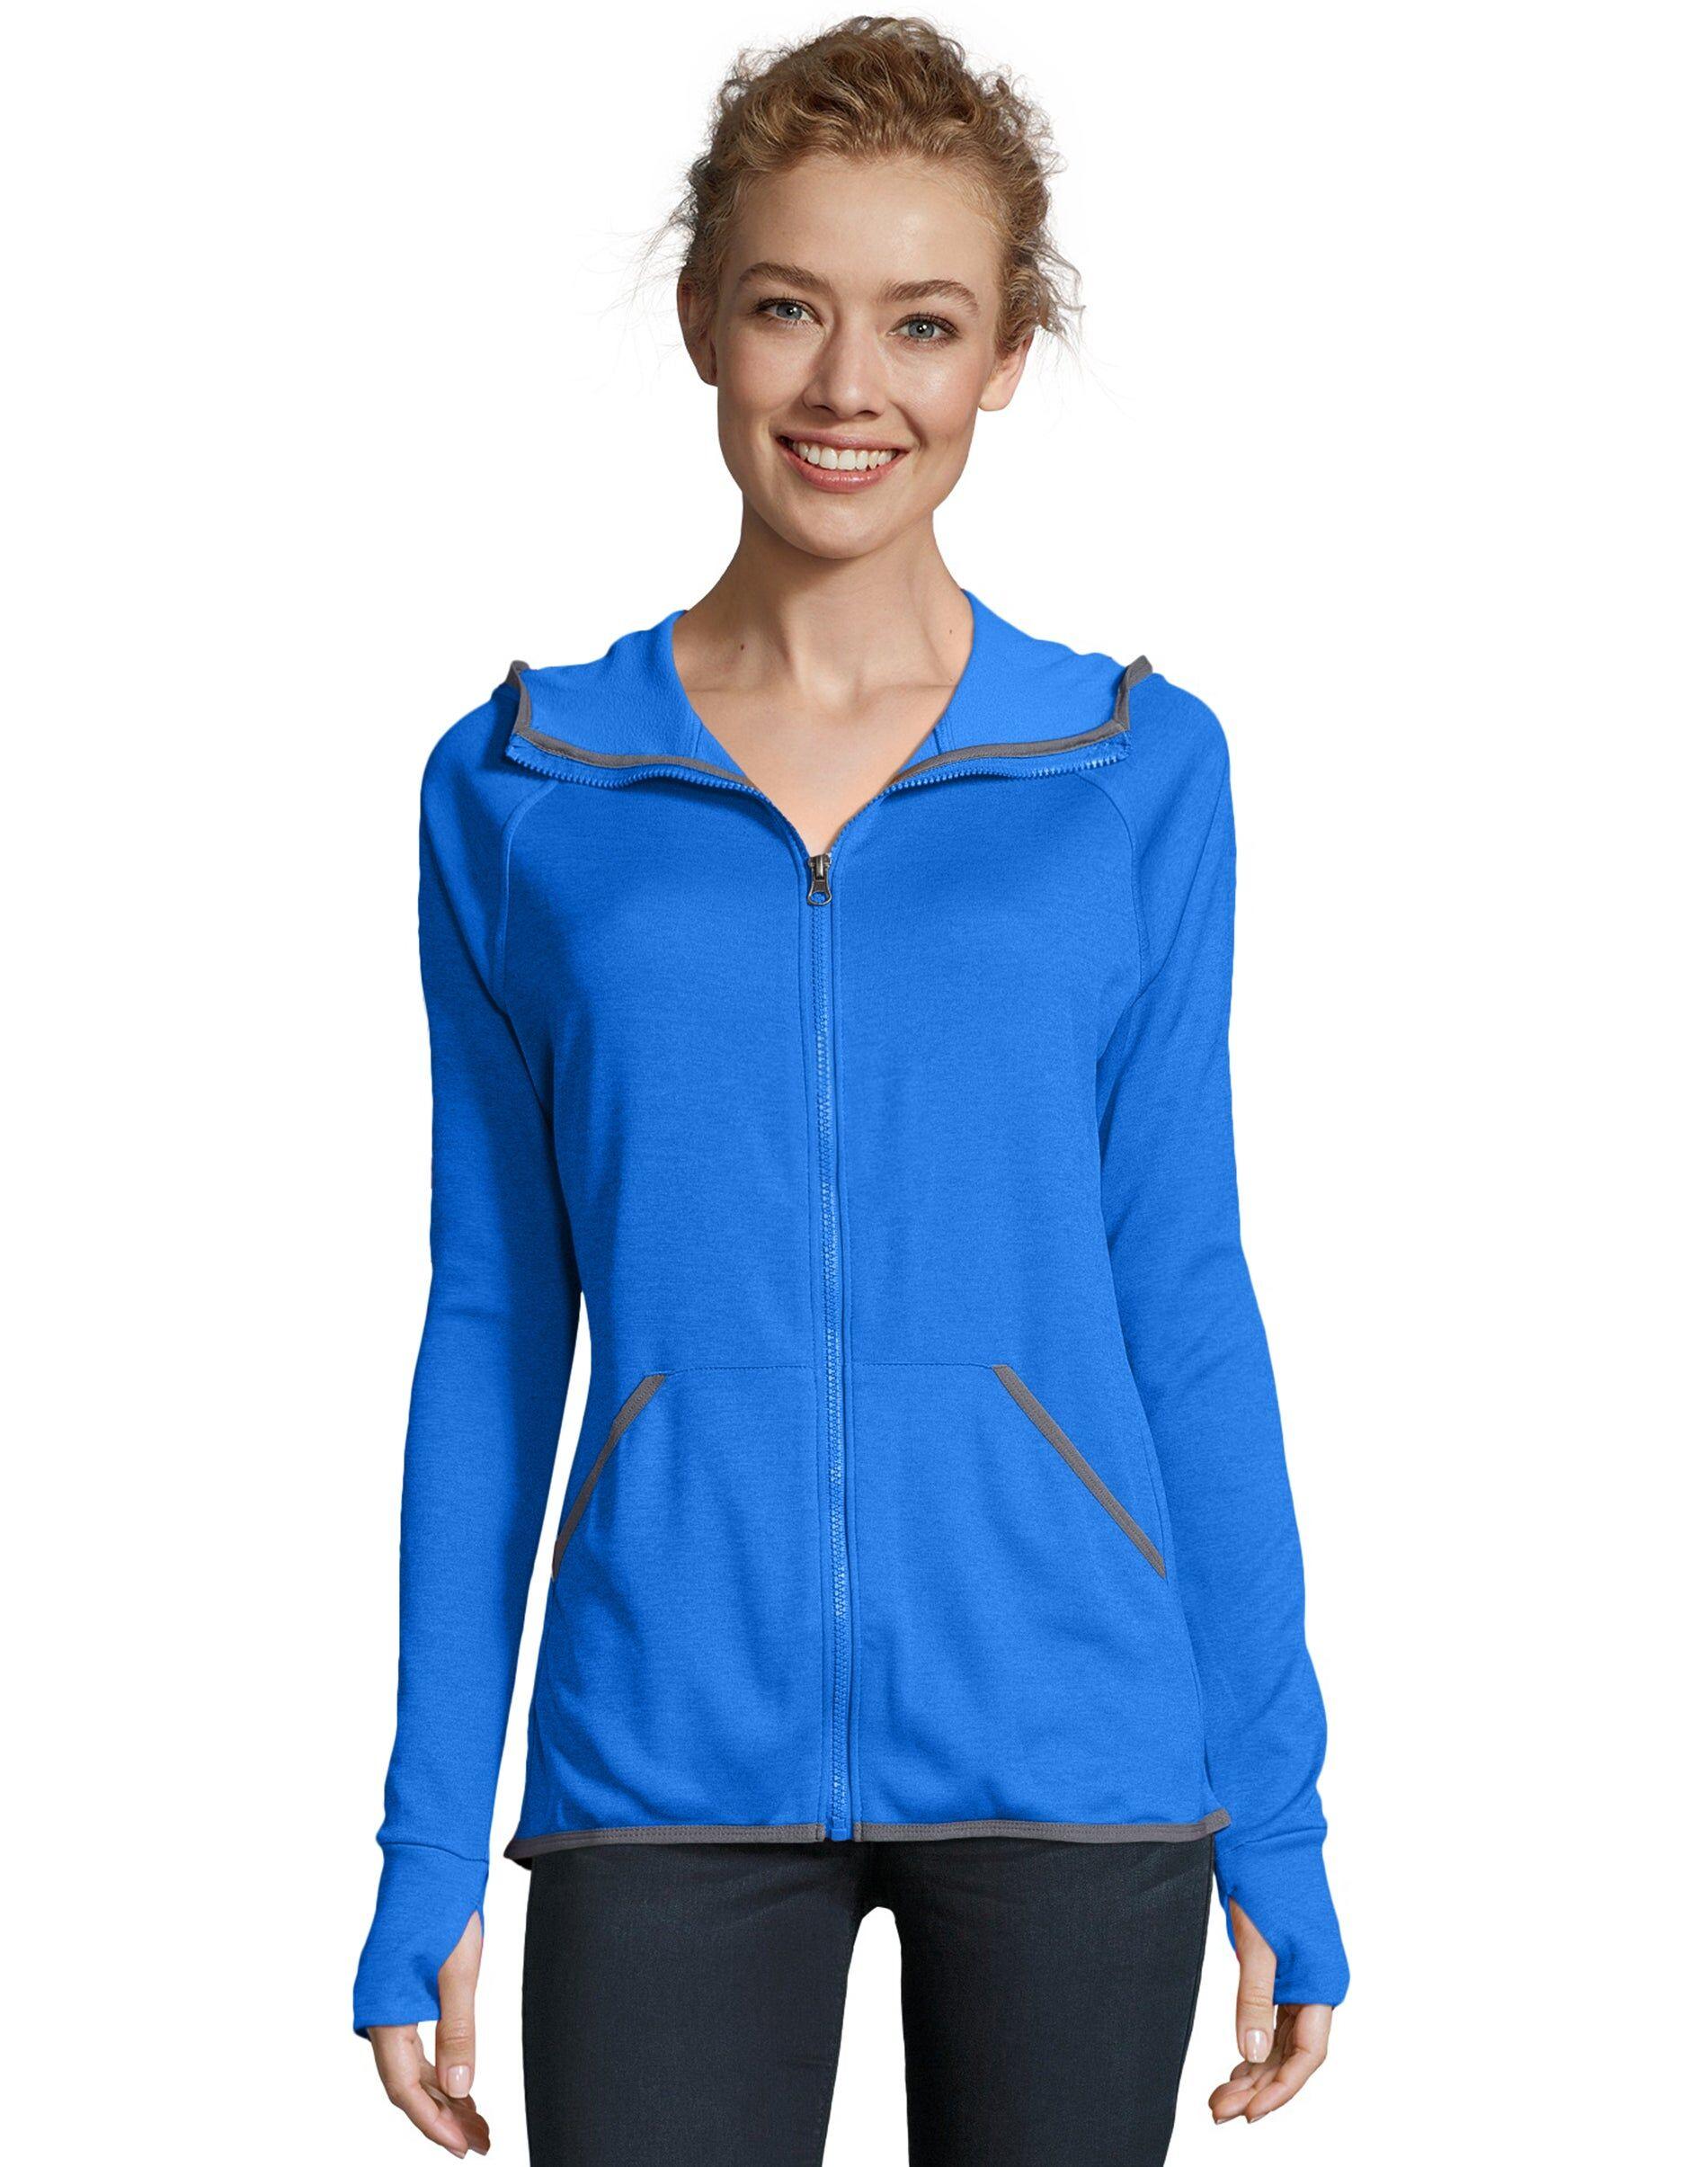 Hanes Sport Women's Performance Fleece Zip Up Hoodie Awesome Blue Heather XL